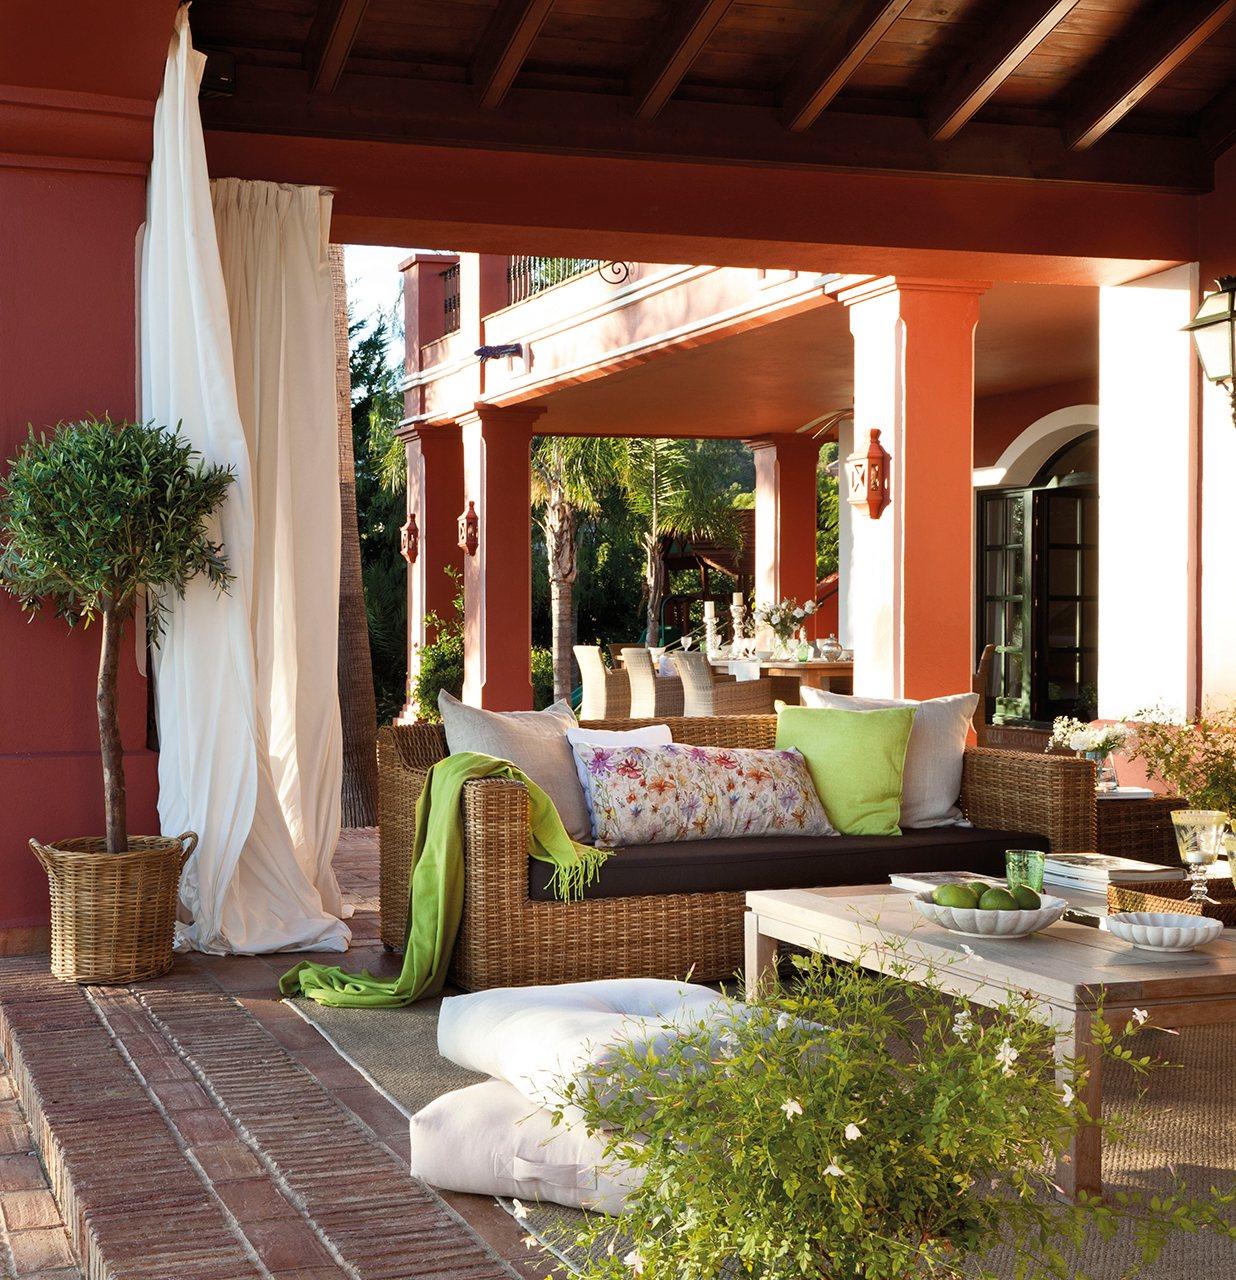 Un porche con el embrujo de la alhambra - Decorar pared porche ...